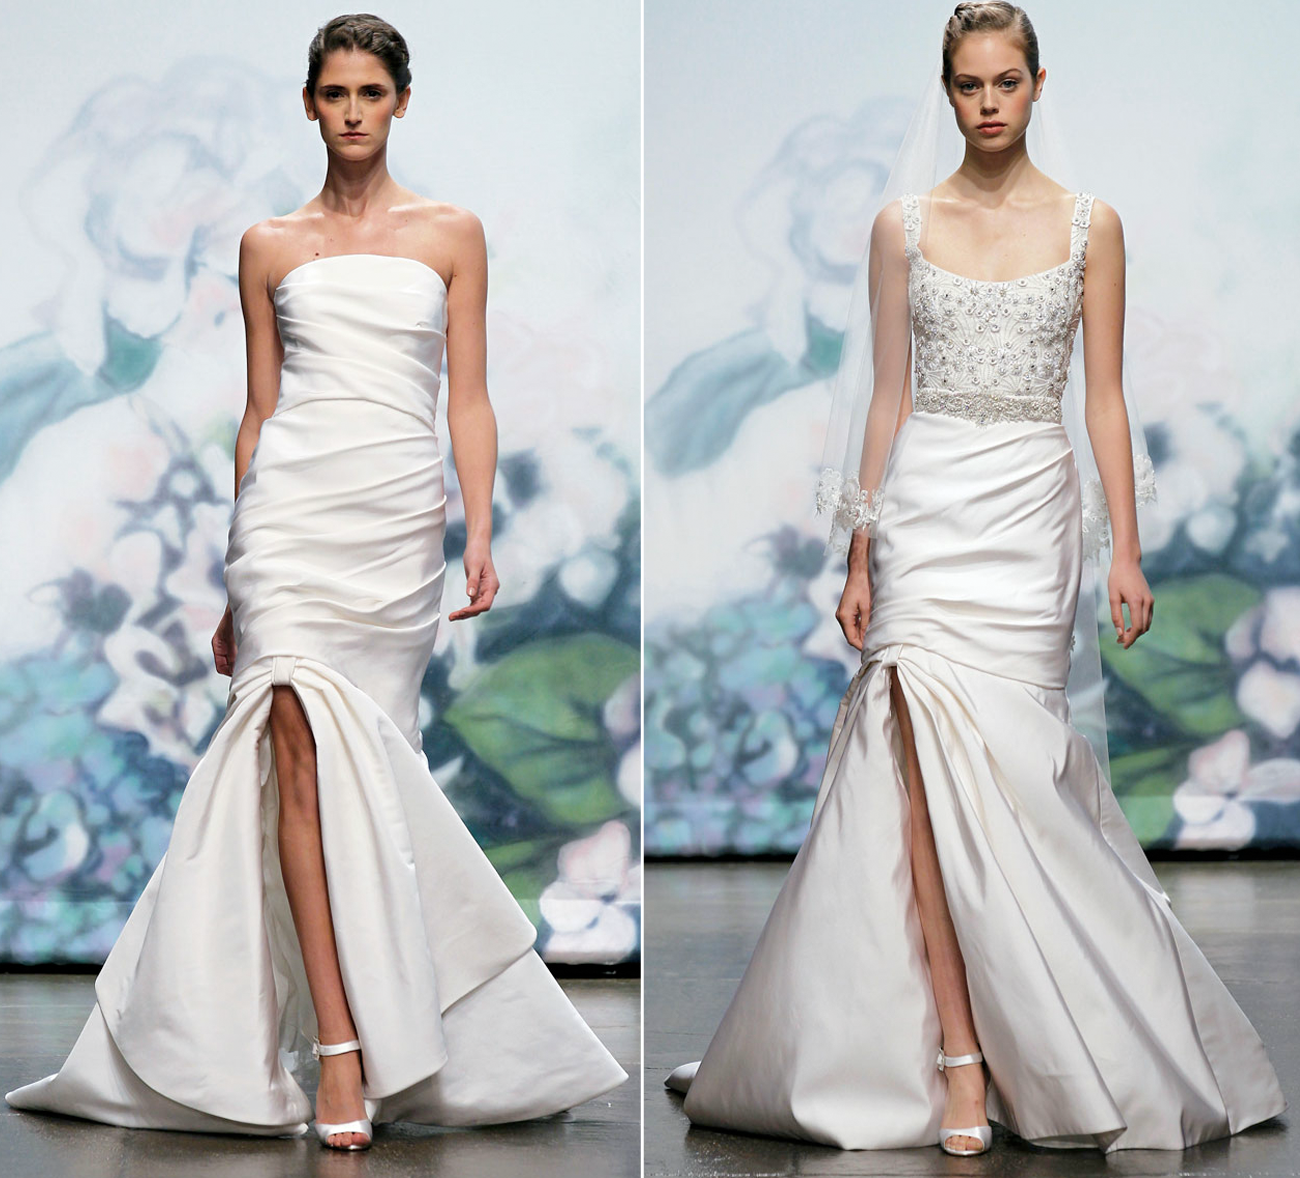 Nice Kim Kardashian First Wedding Dress Composition - All Wedding ...